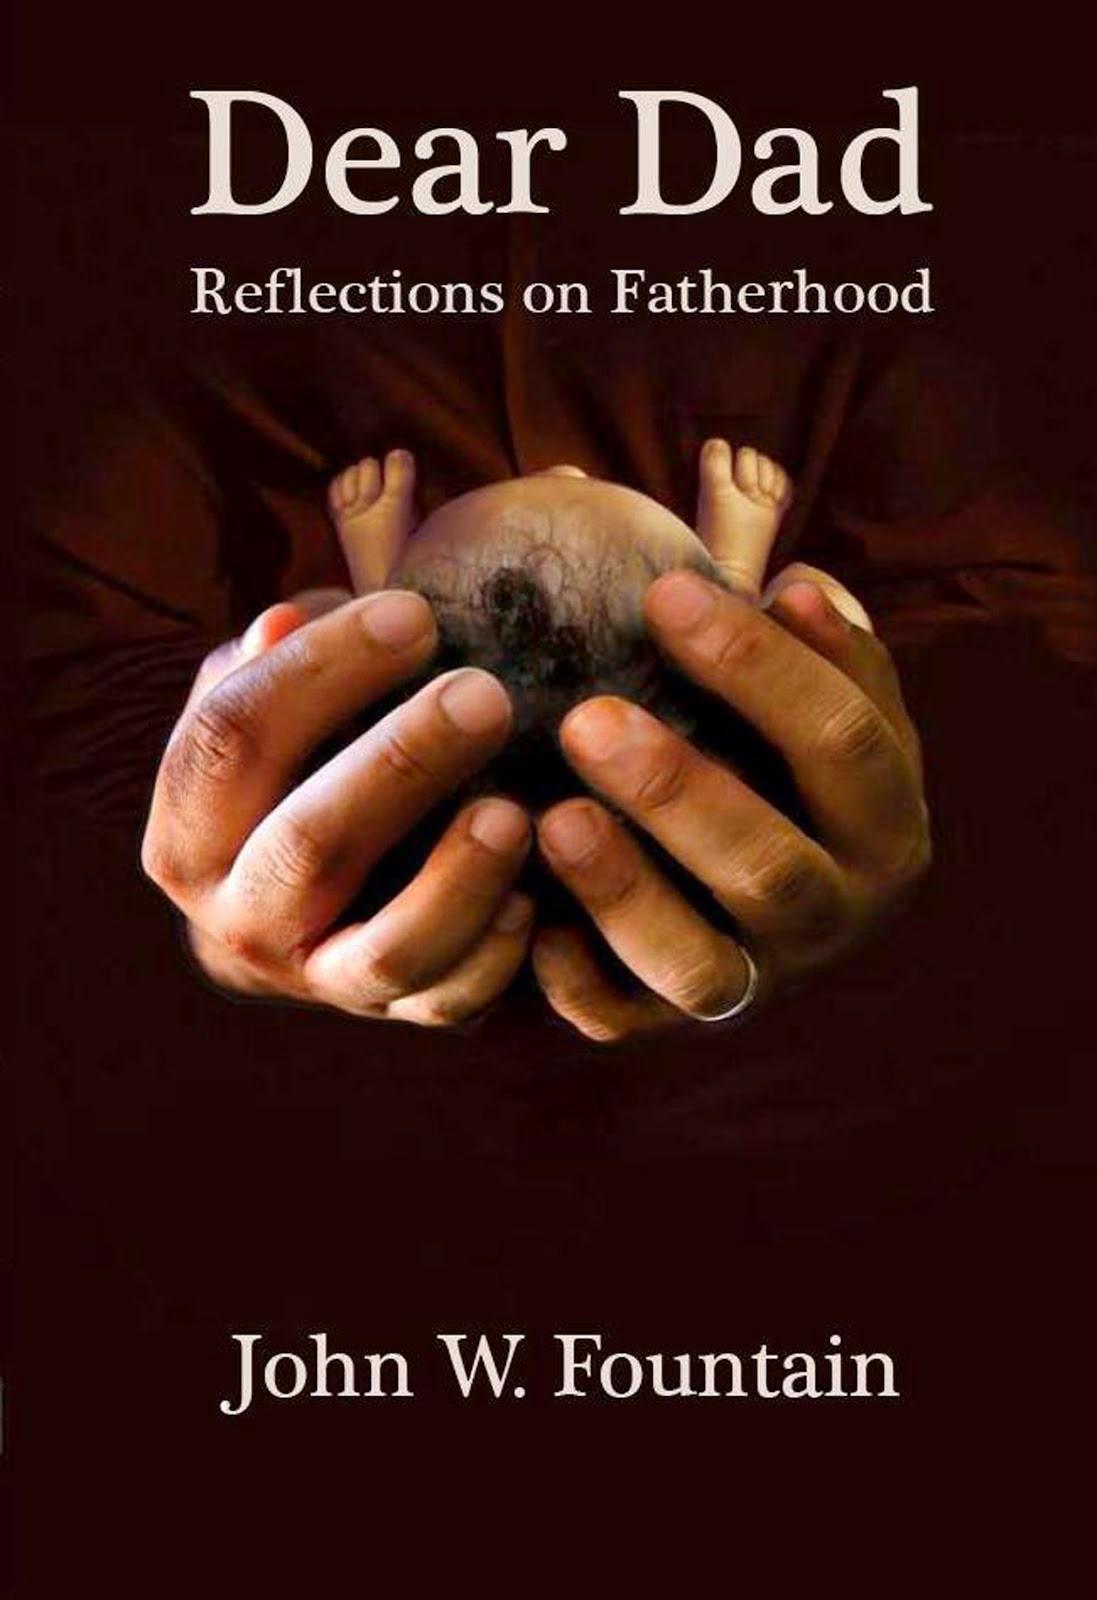 Buy Dear Dad: Reflections on Fatherhood